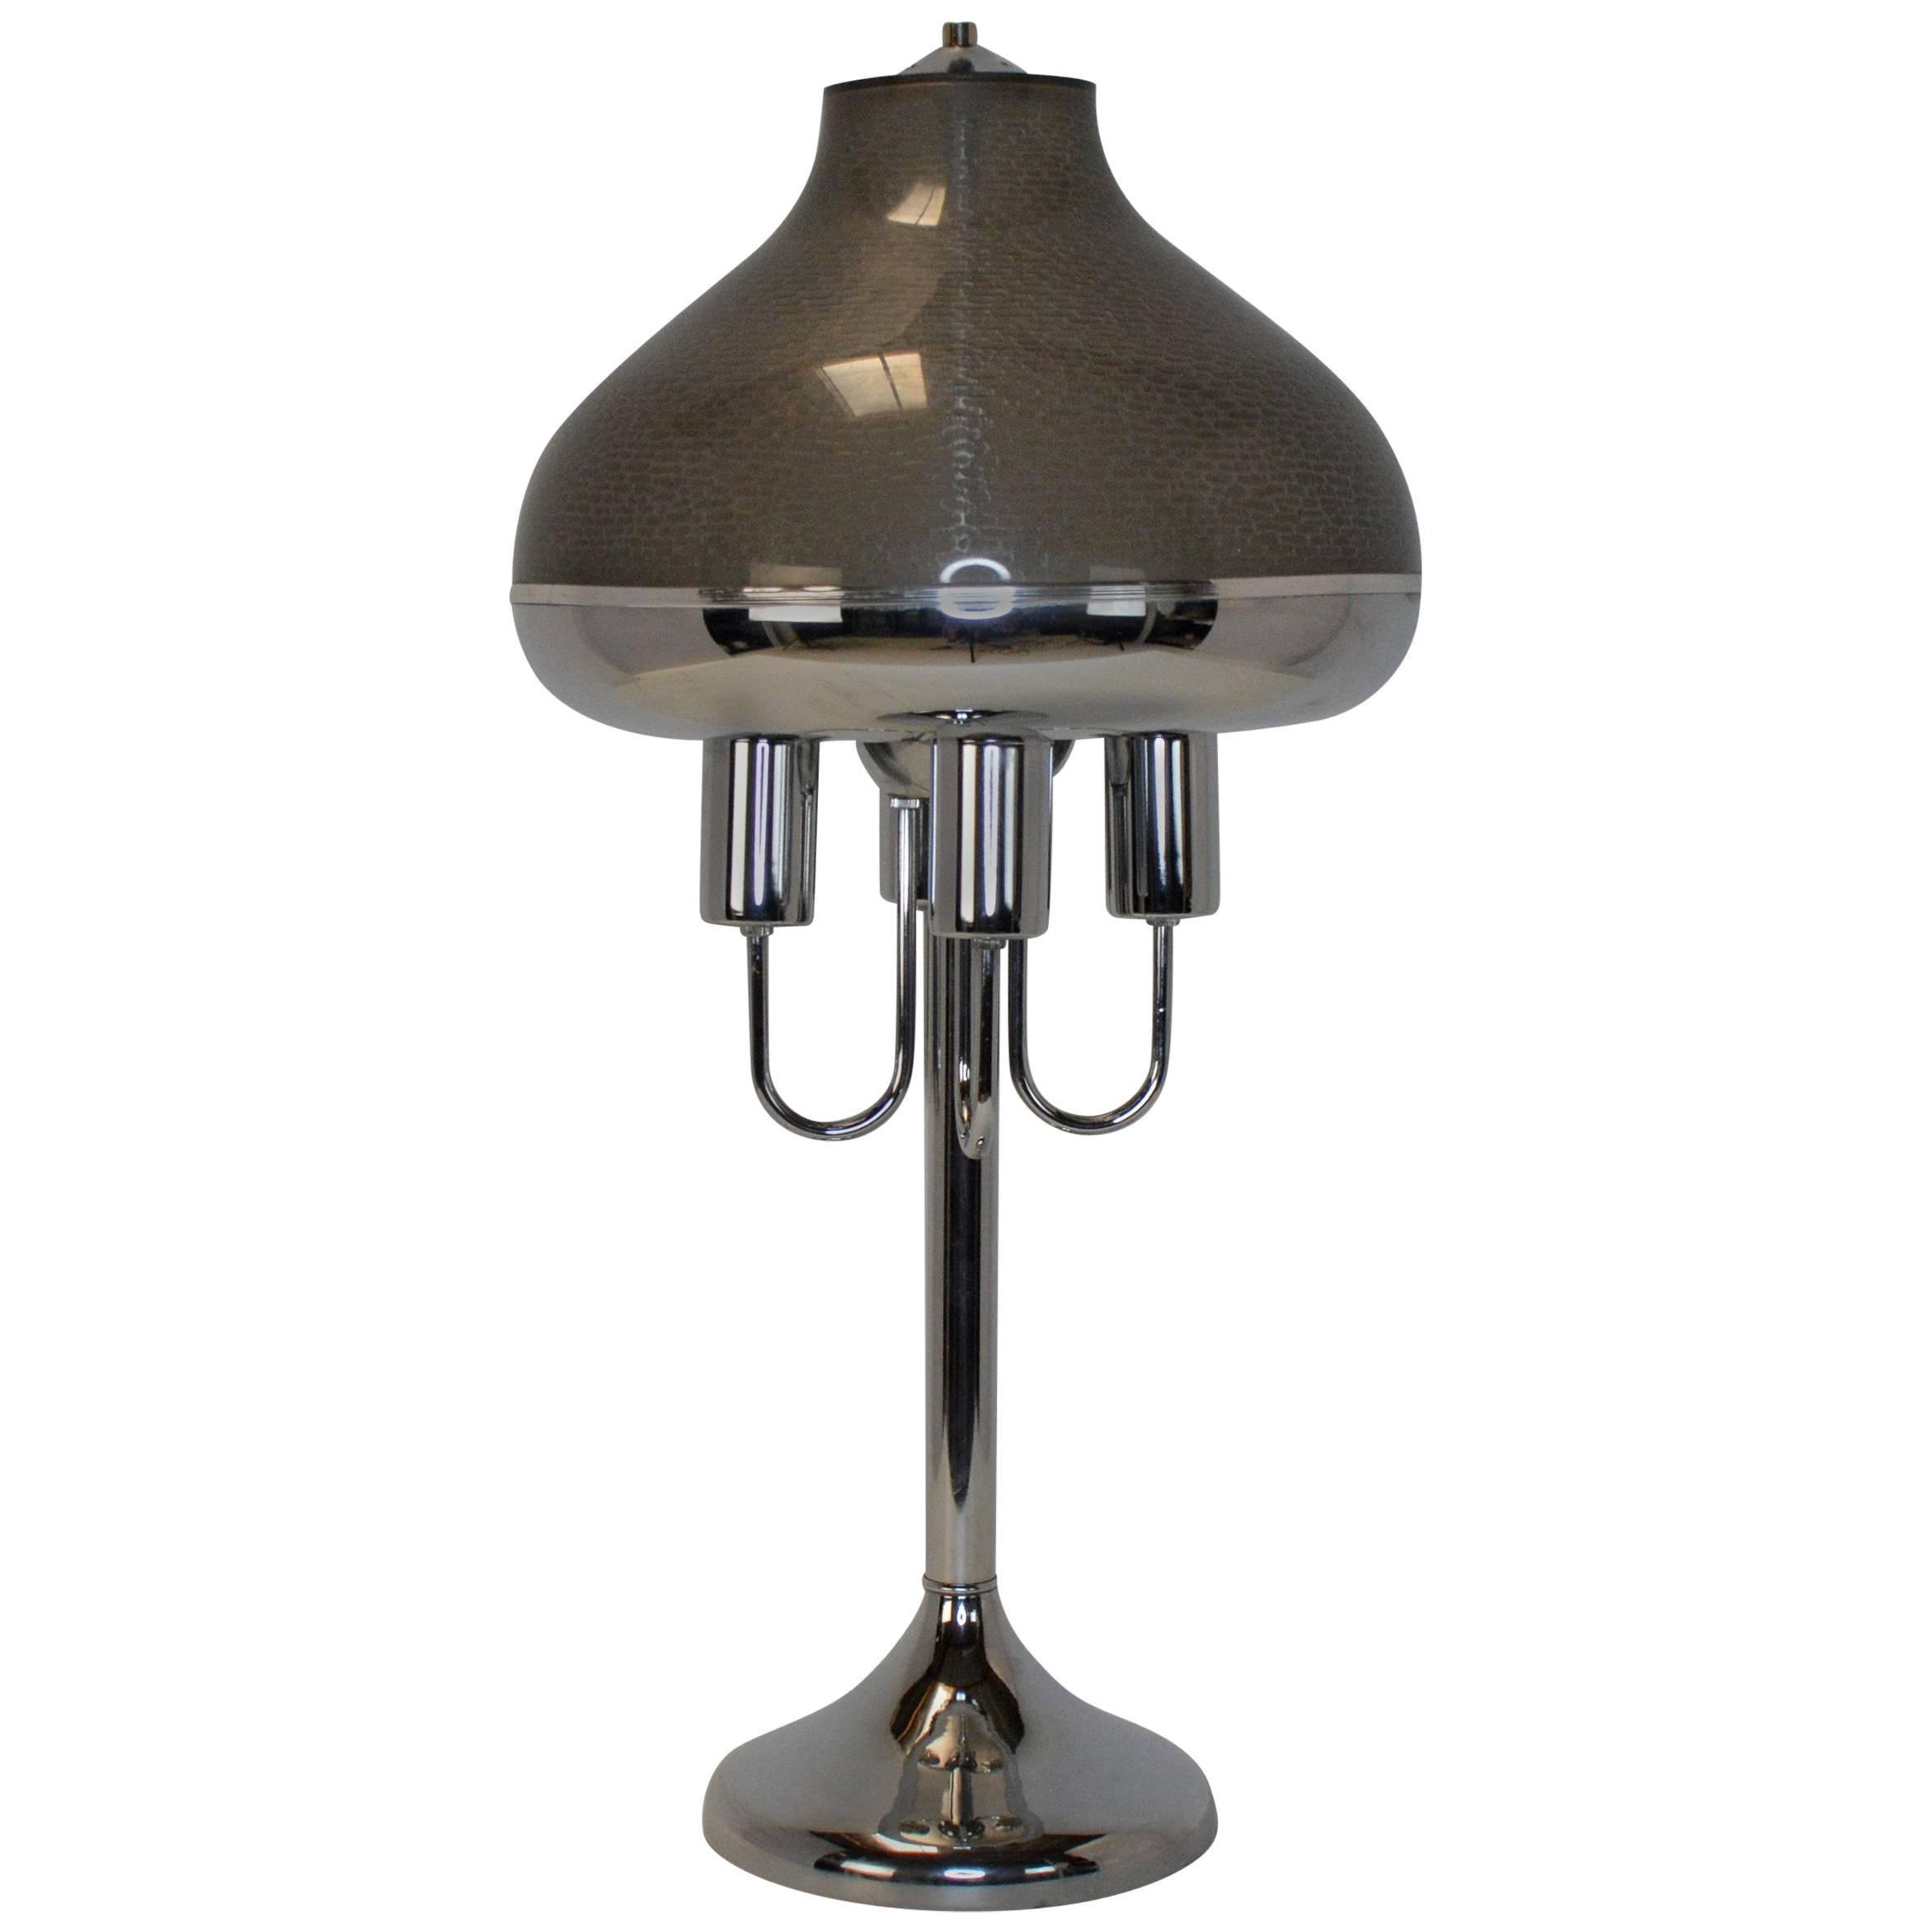 Italian Modern Table Lamp, 1970s-1980s